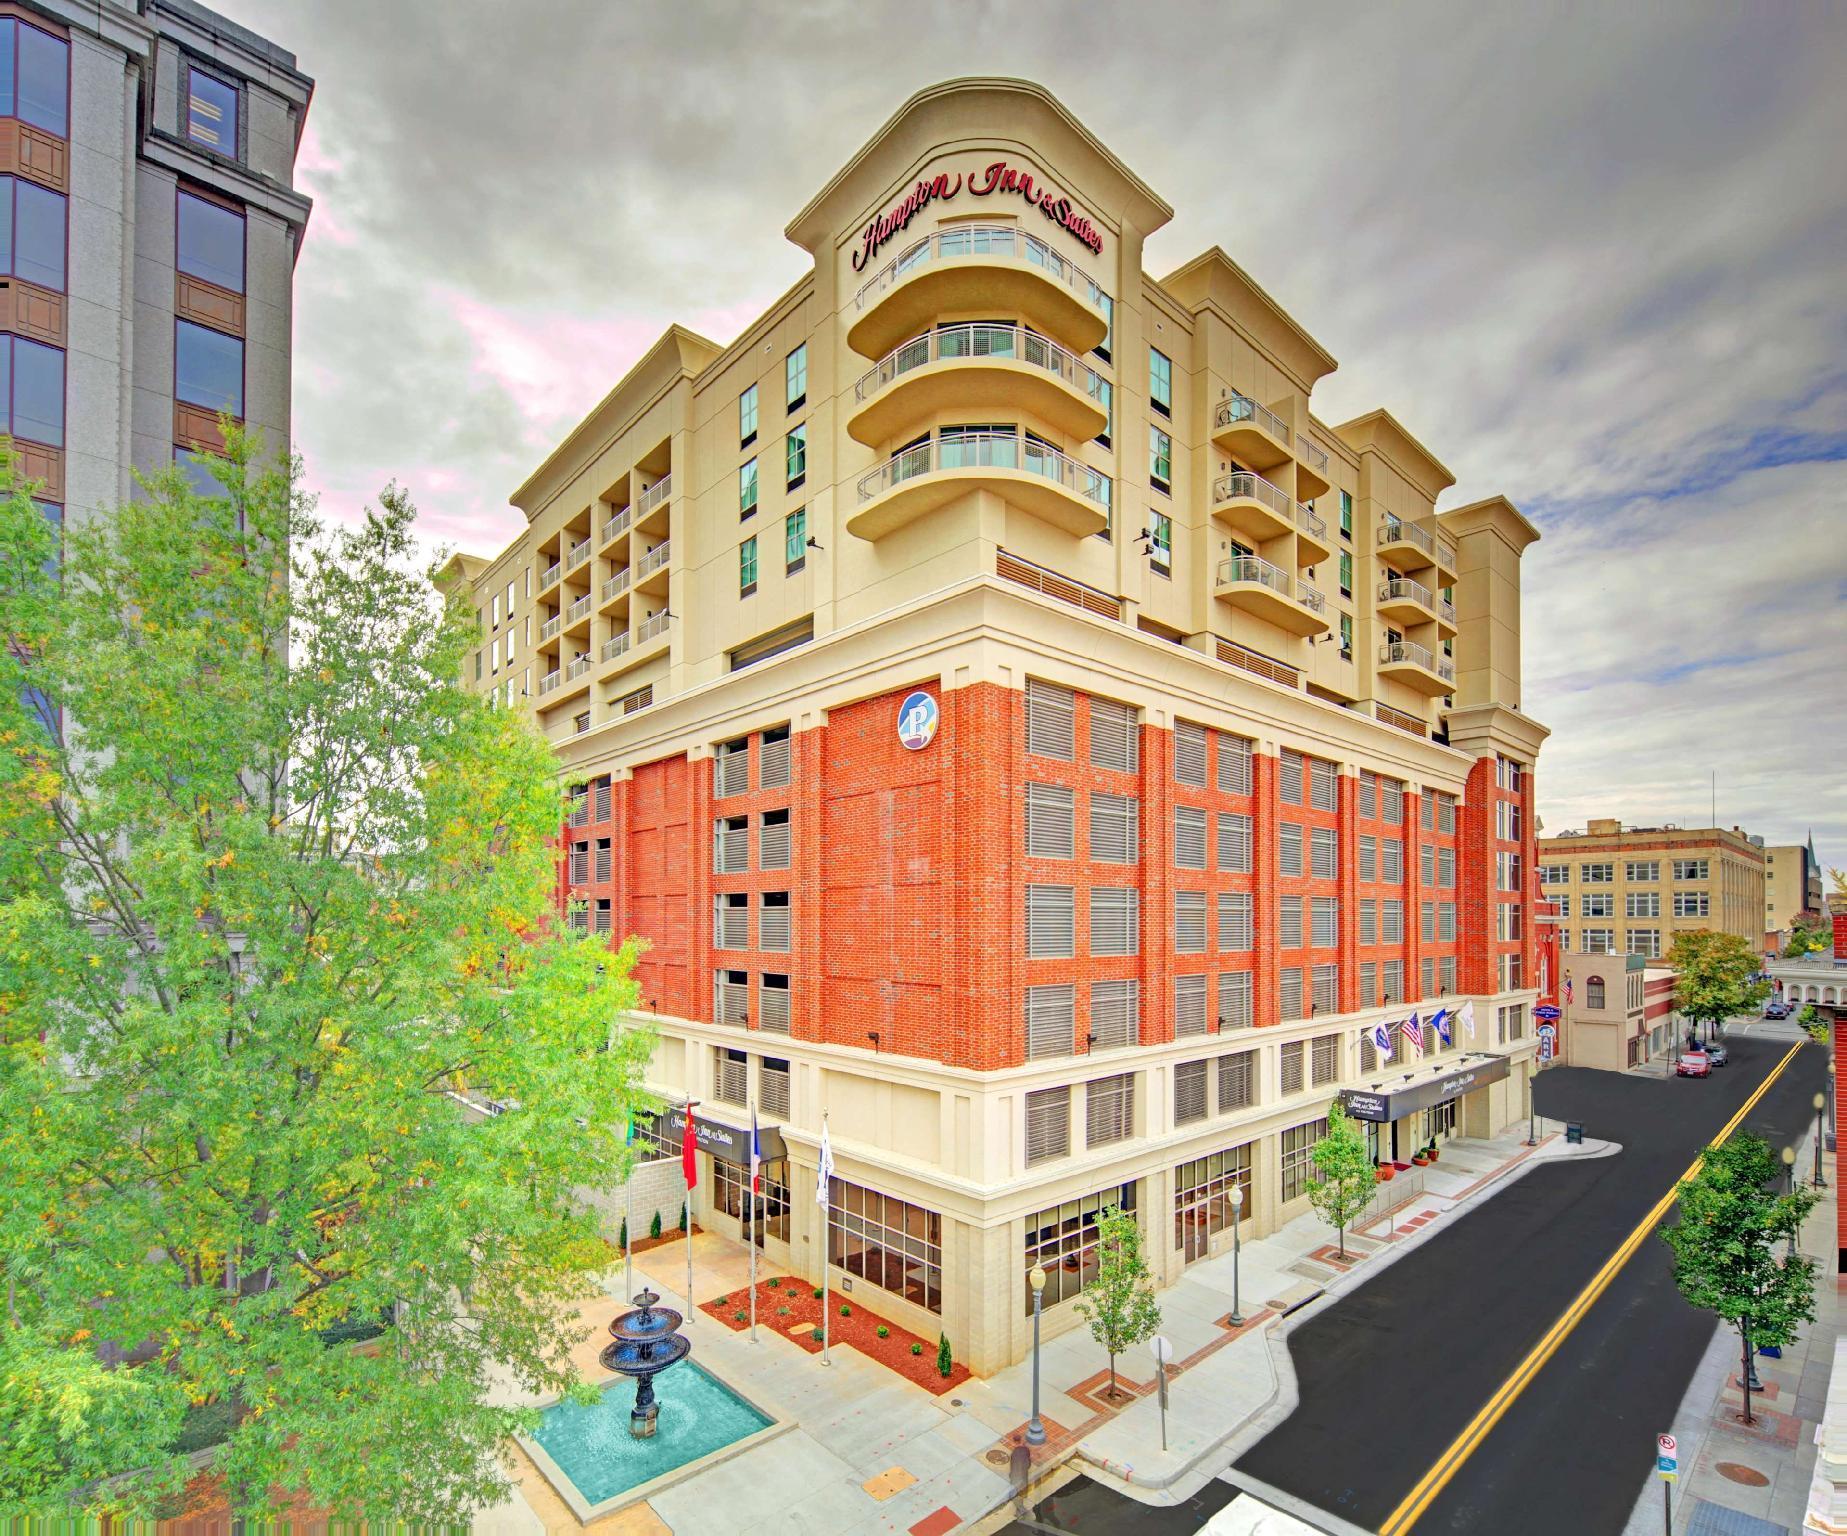 Hampton Inn And Suites Roanoke Downtown